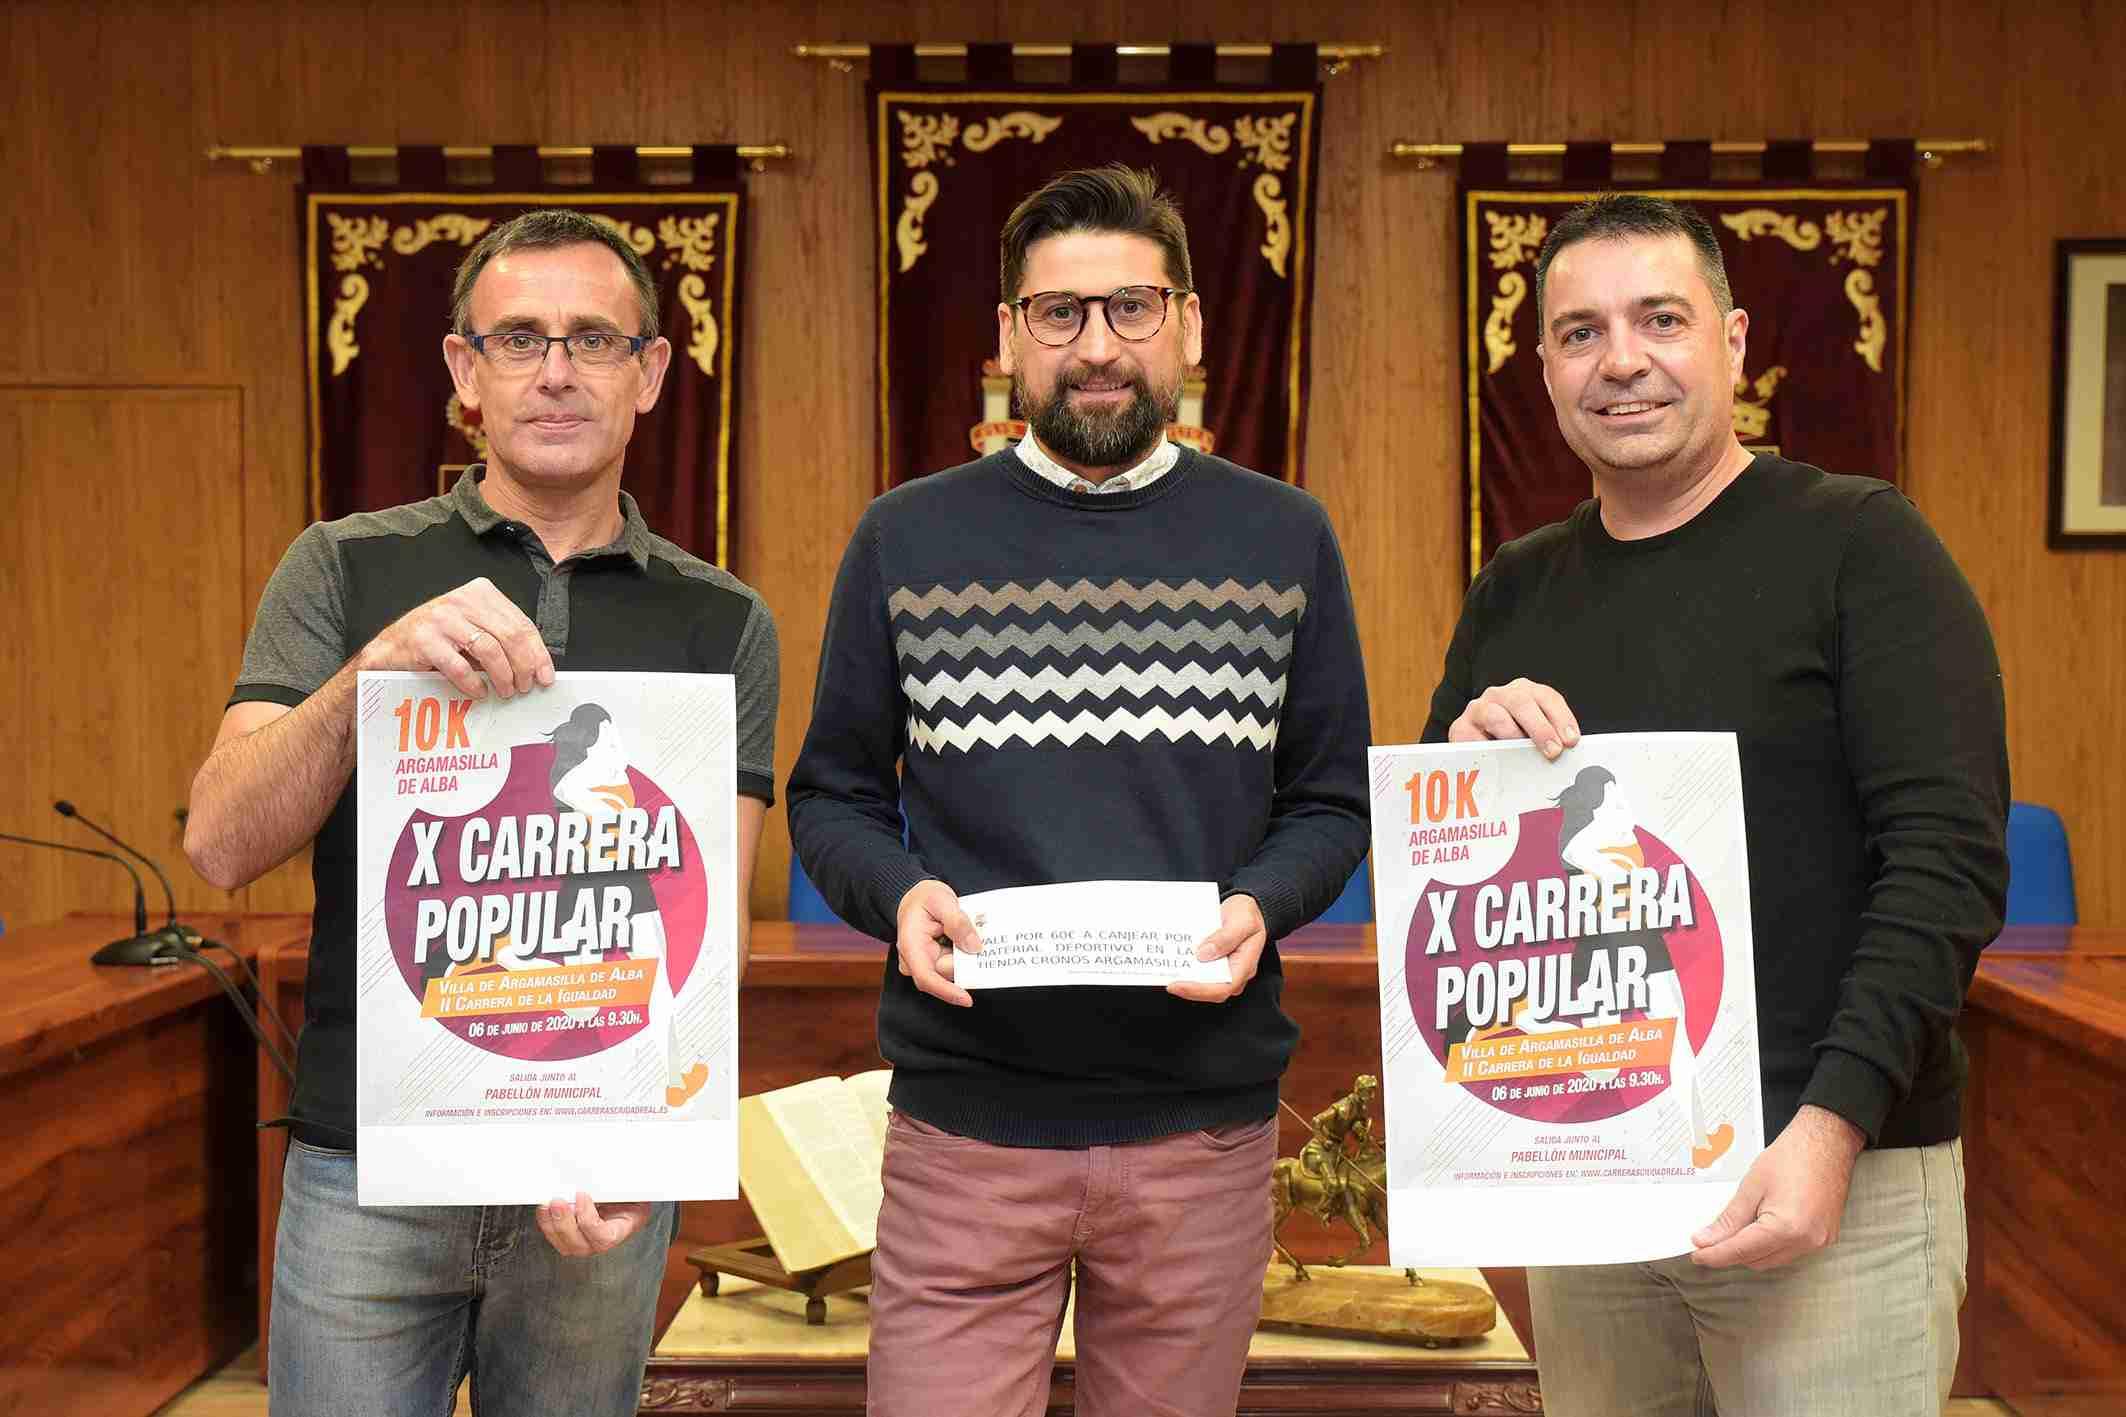 Iván Cañas gana el concurso de carteles de la X Carrera Popular de Argamasilla de Alba 1